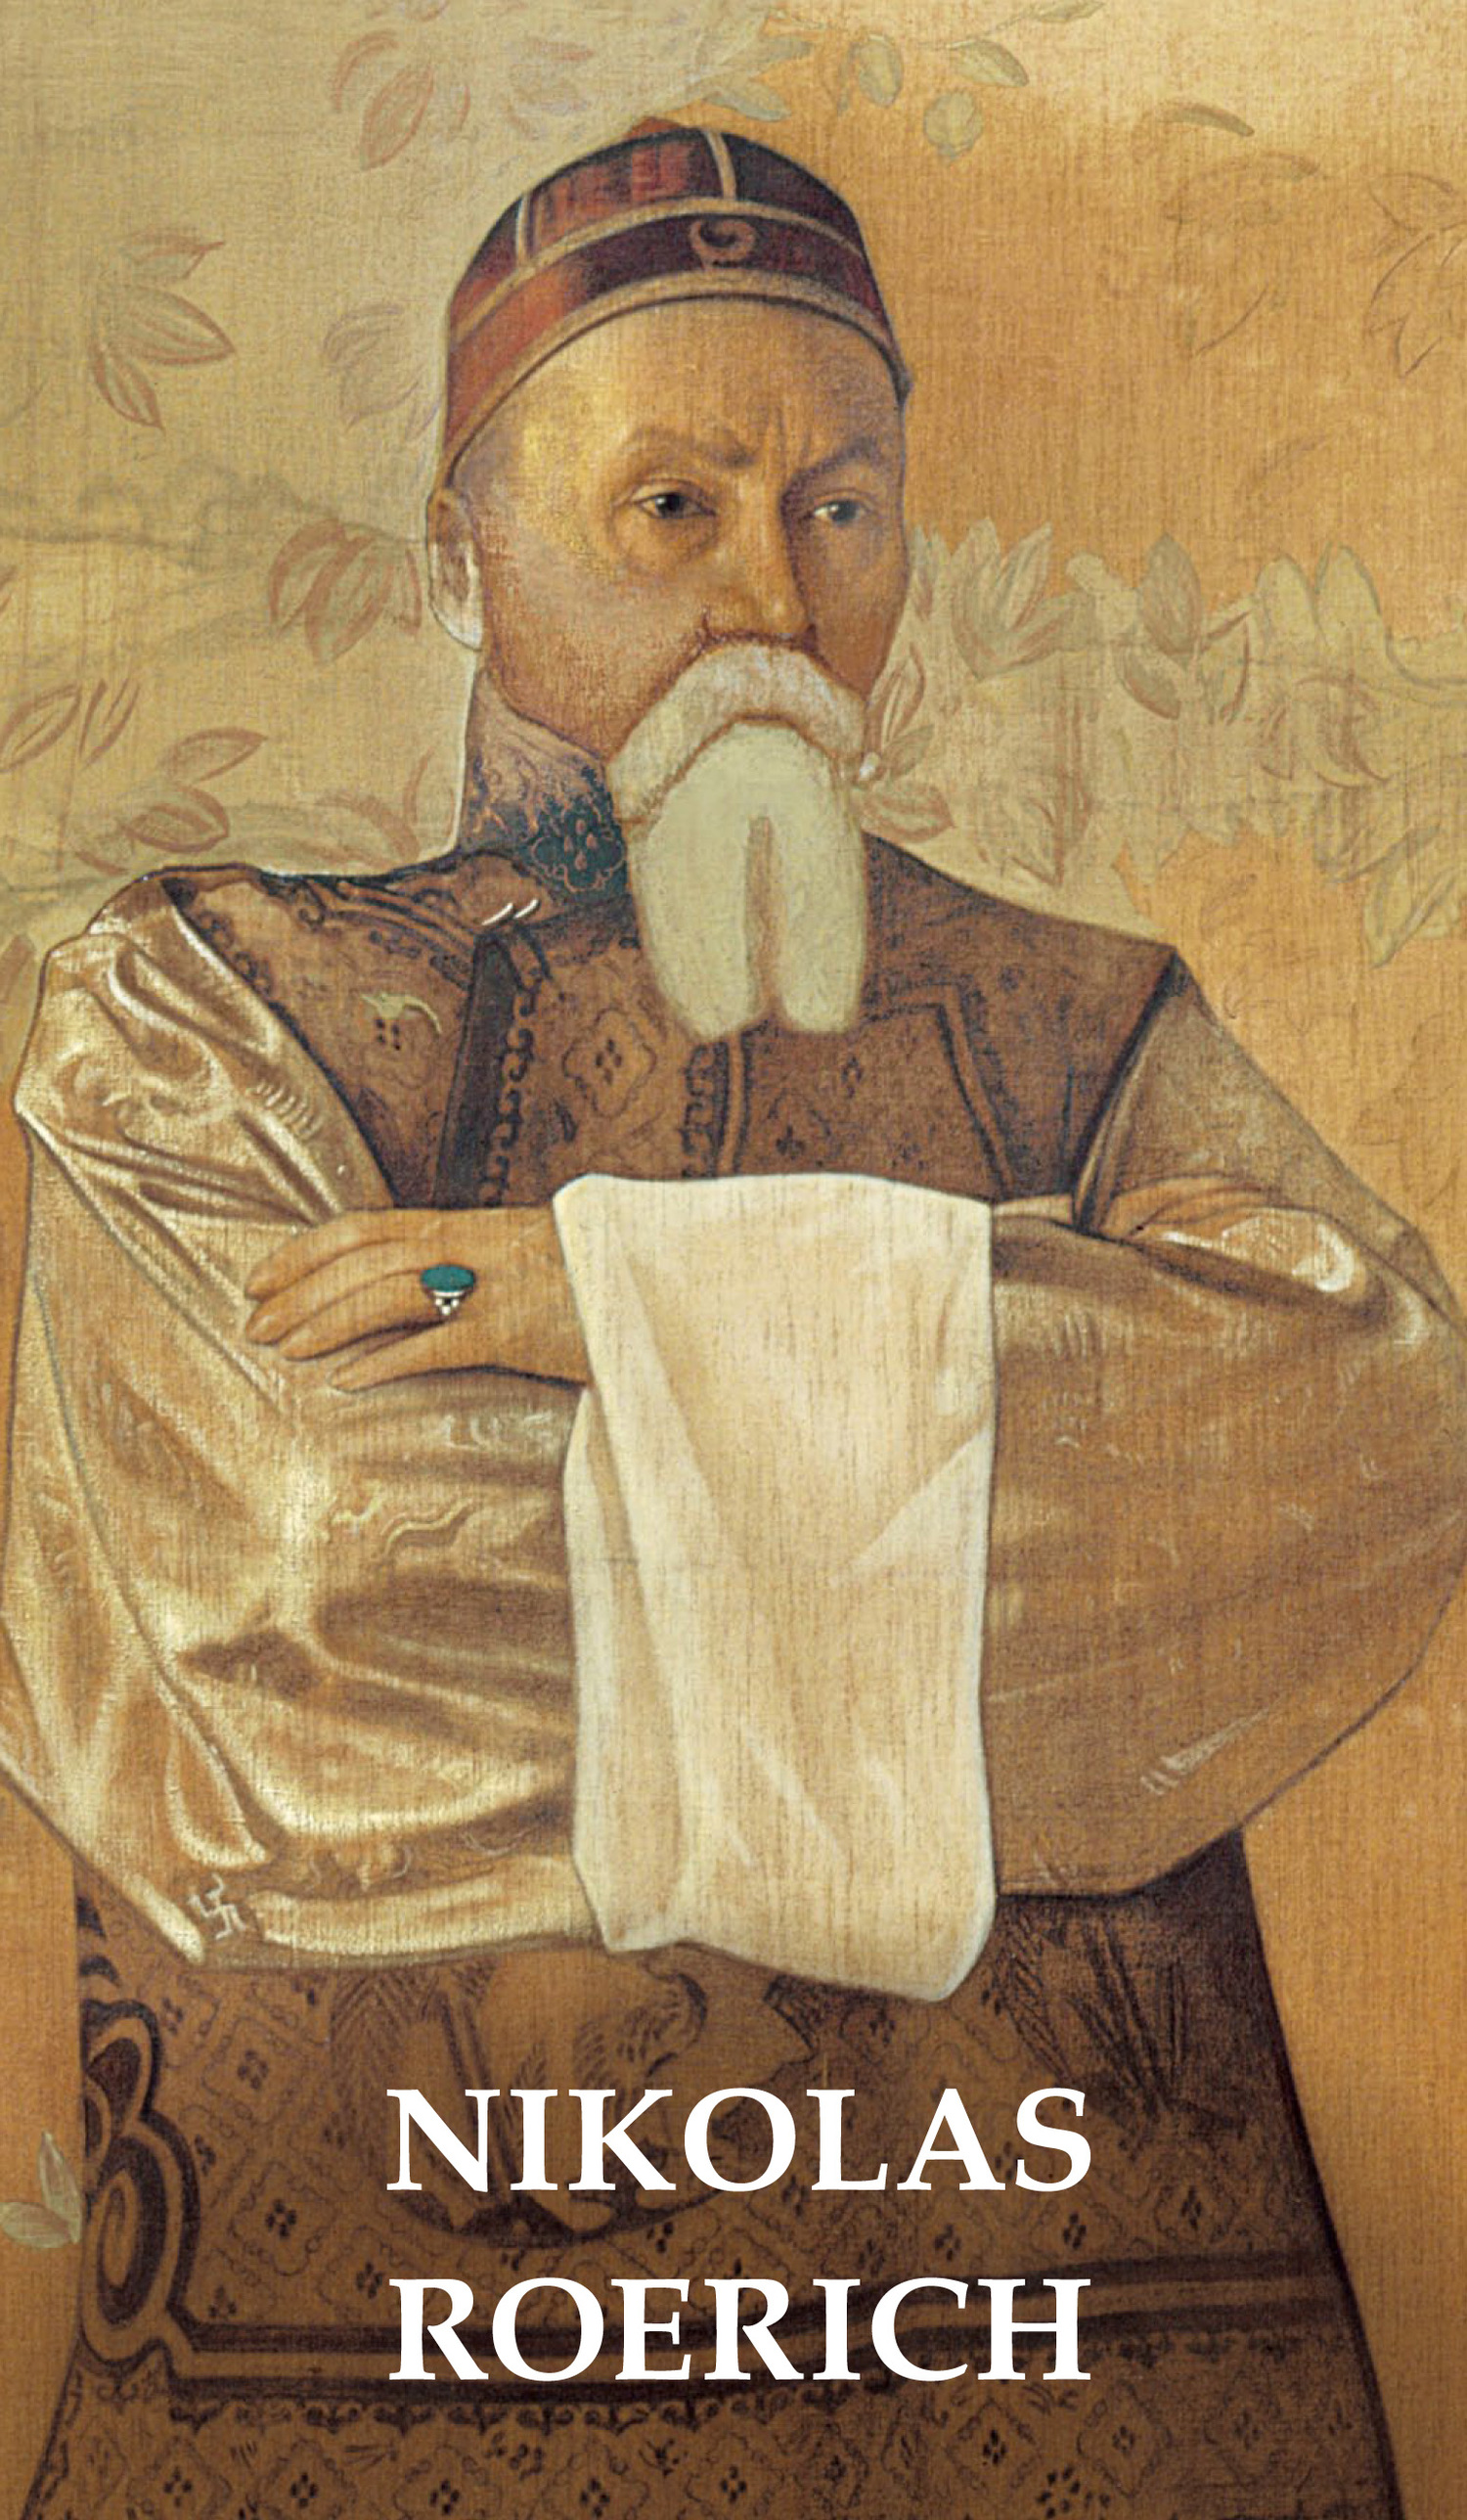 Т. О. Книжник Nikolas Roerich сапоги quelle der spur 1013540